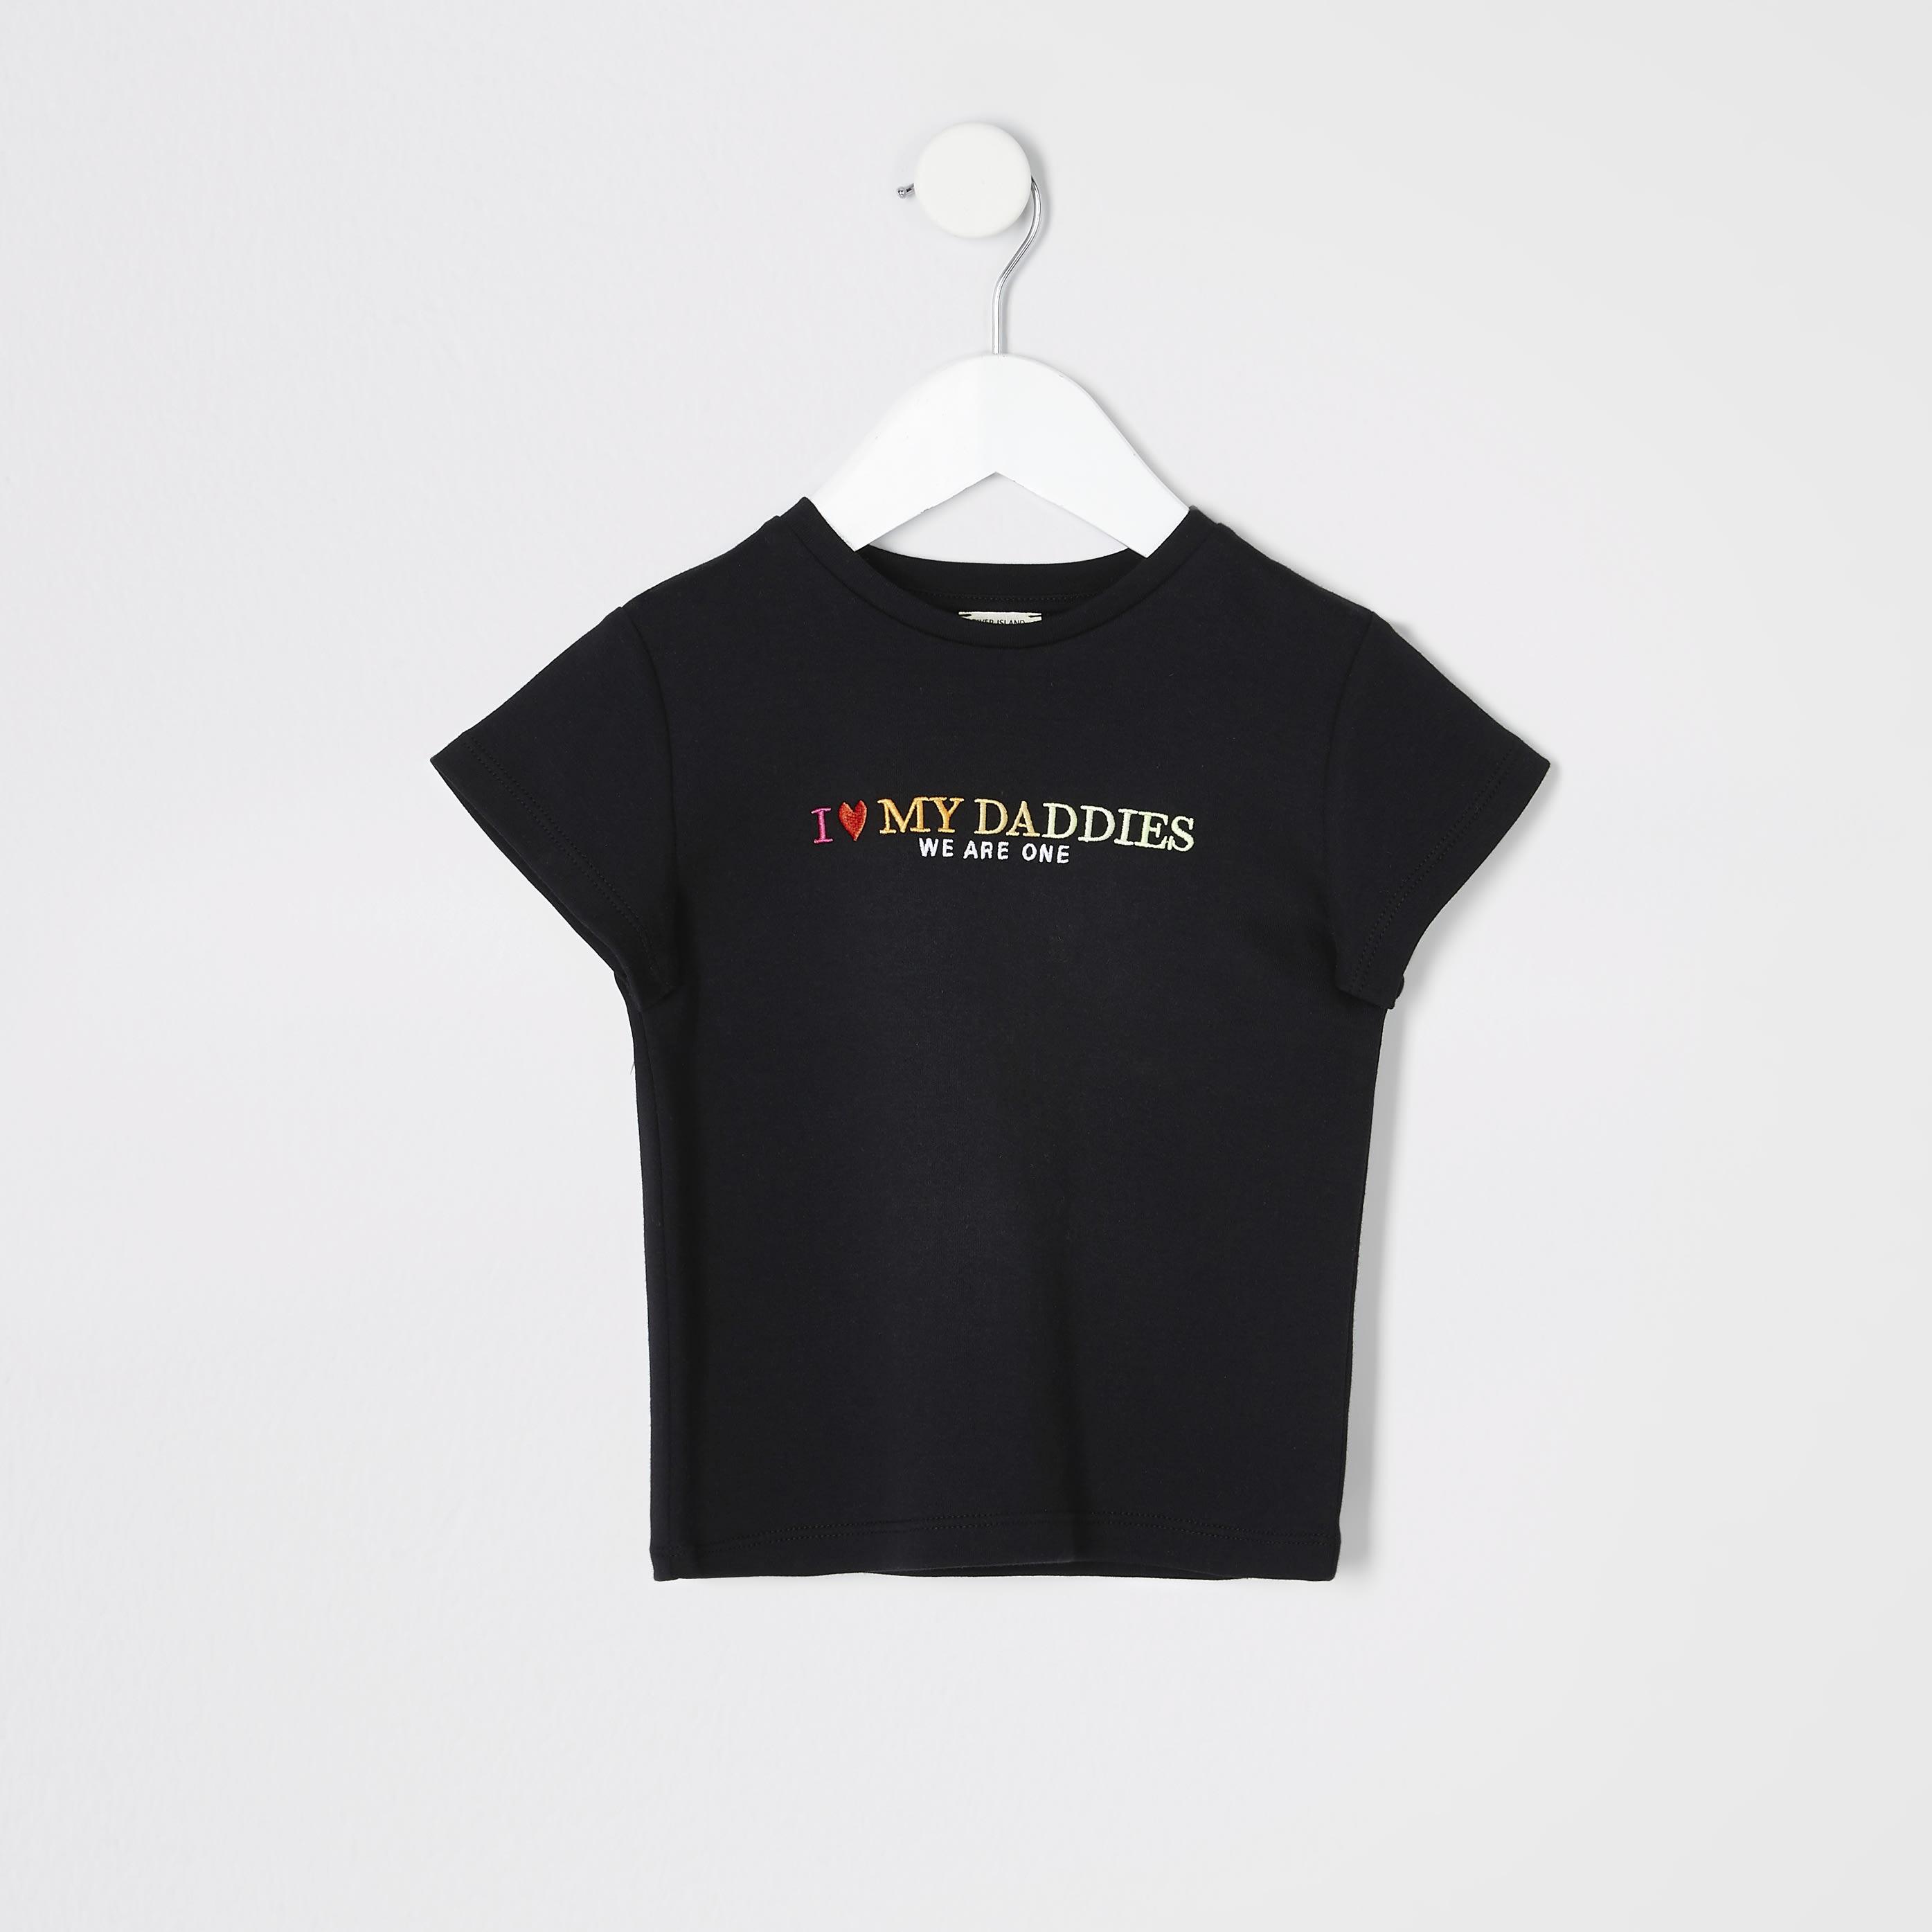 River Island Mini kids Black 'We are one' pride T-shirt (3-4 Yrs)